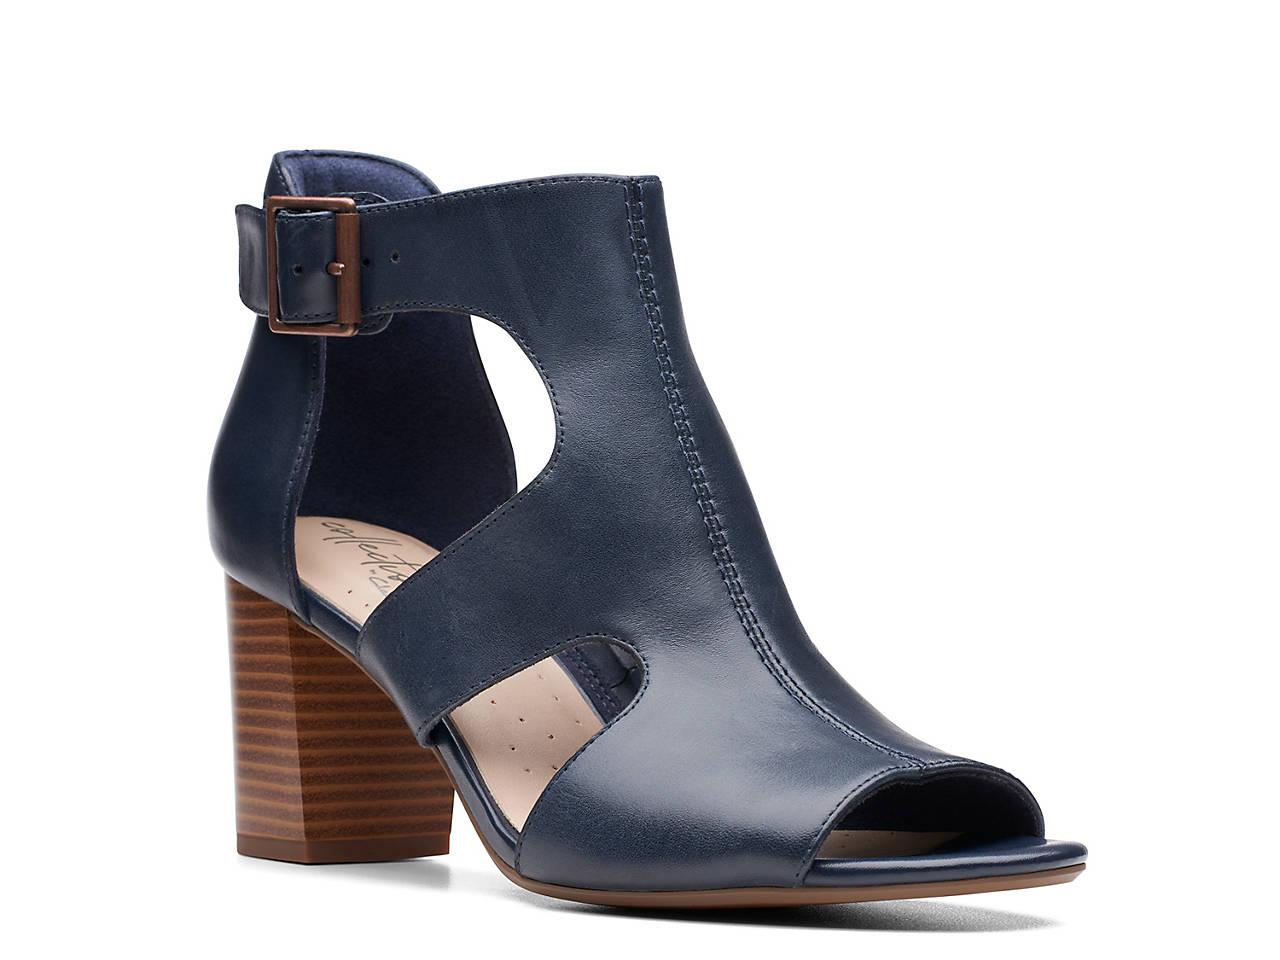 9f69c0bdf8d8 Clarks Deva Heidi Sandal Women s Shoes